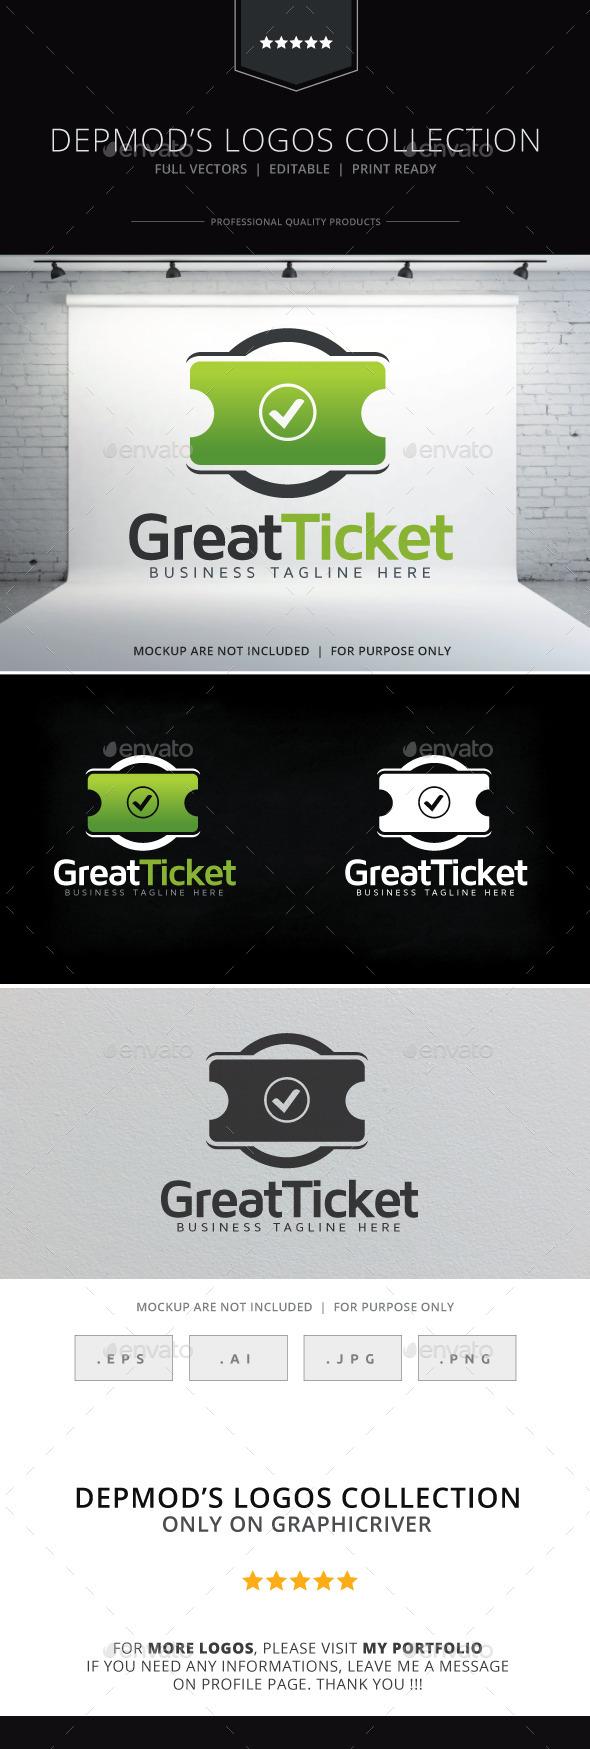 GraphicRiver Great Ticket Logo 9845697